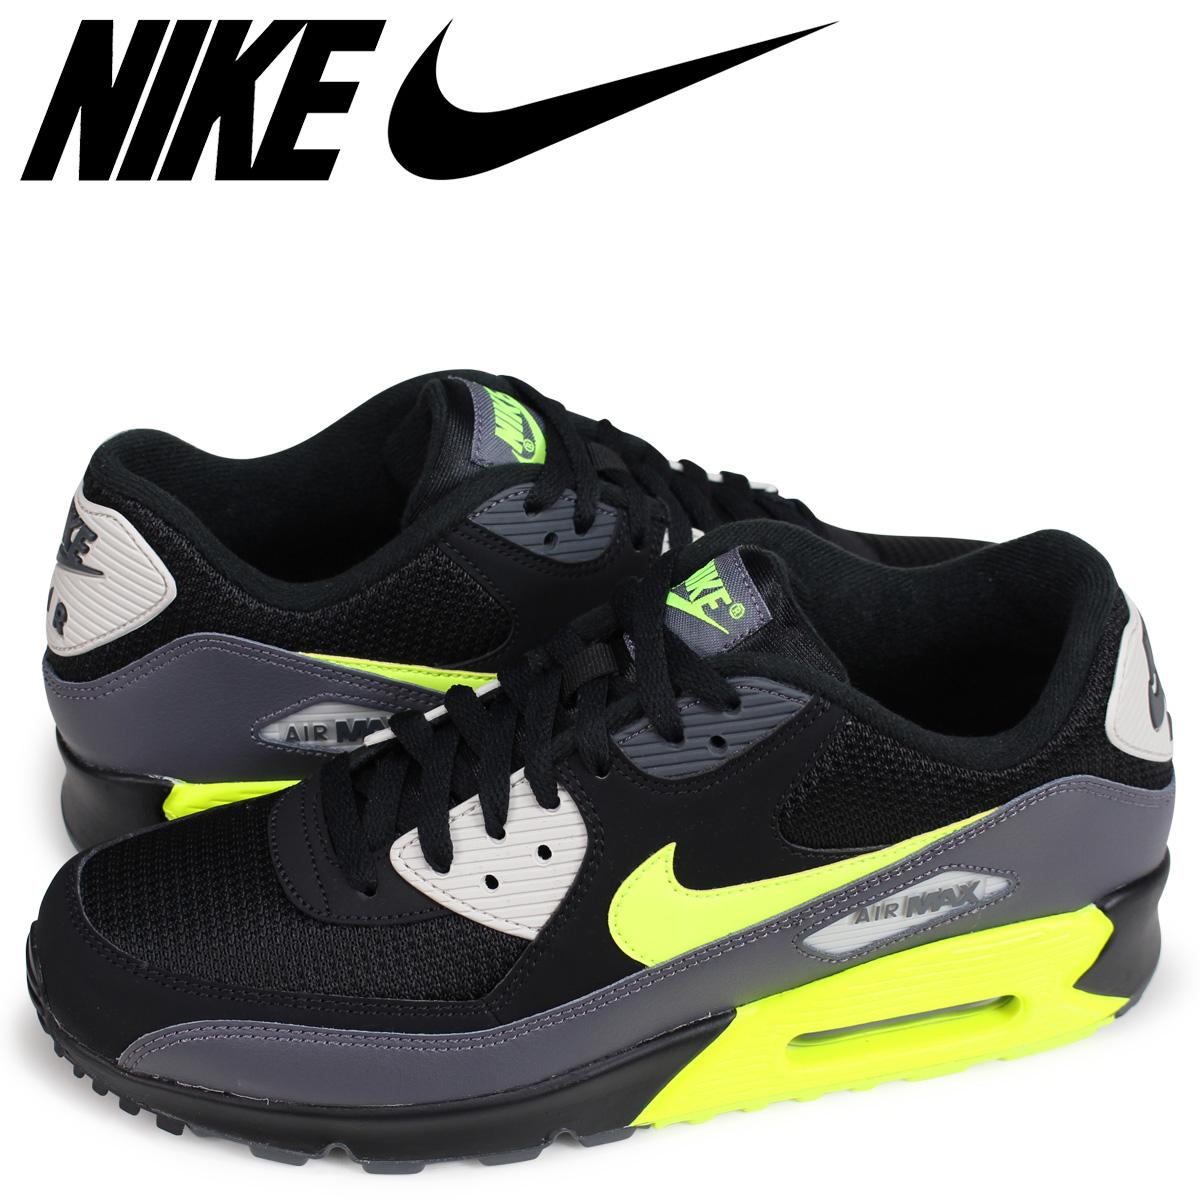 competitive price c67f6 953b3 Nike NIKE Air Max 90 essential sneakers men AIR MAX 90 ESSENTIAL AJ1285-015  black ...